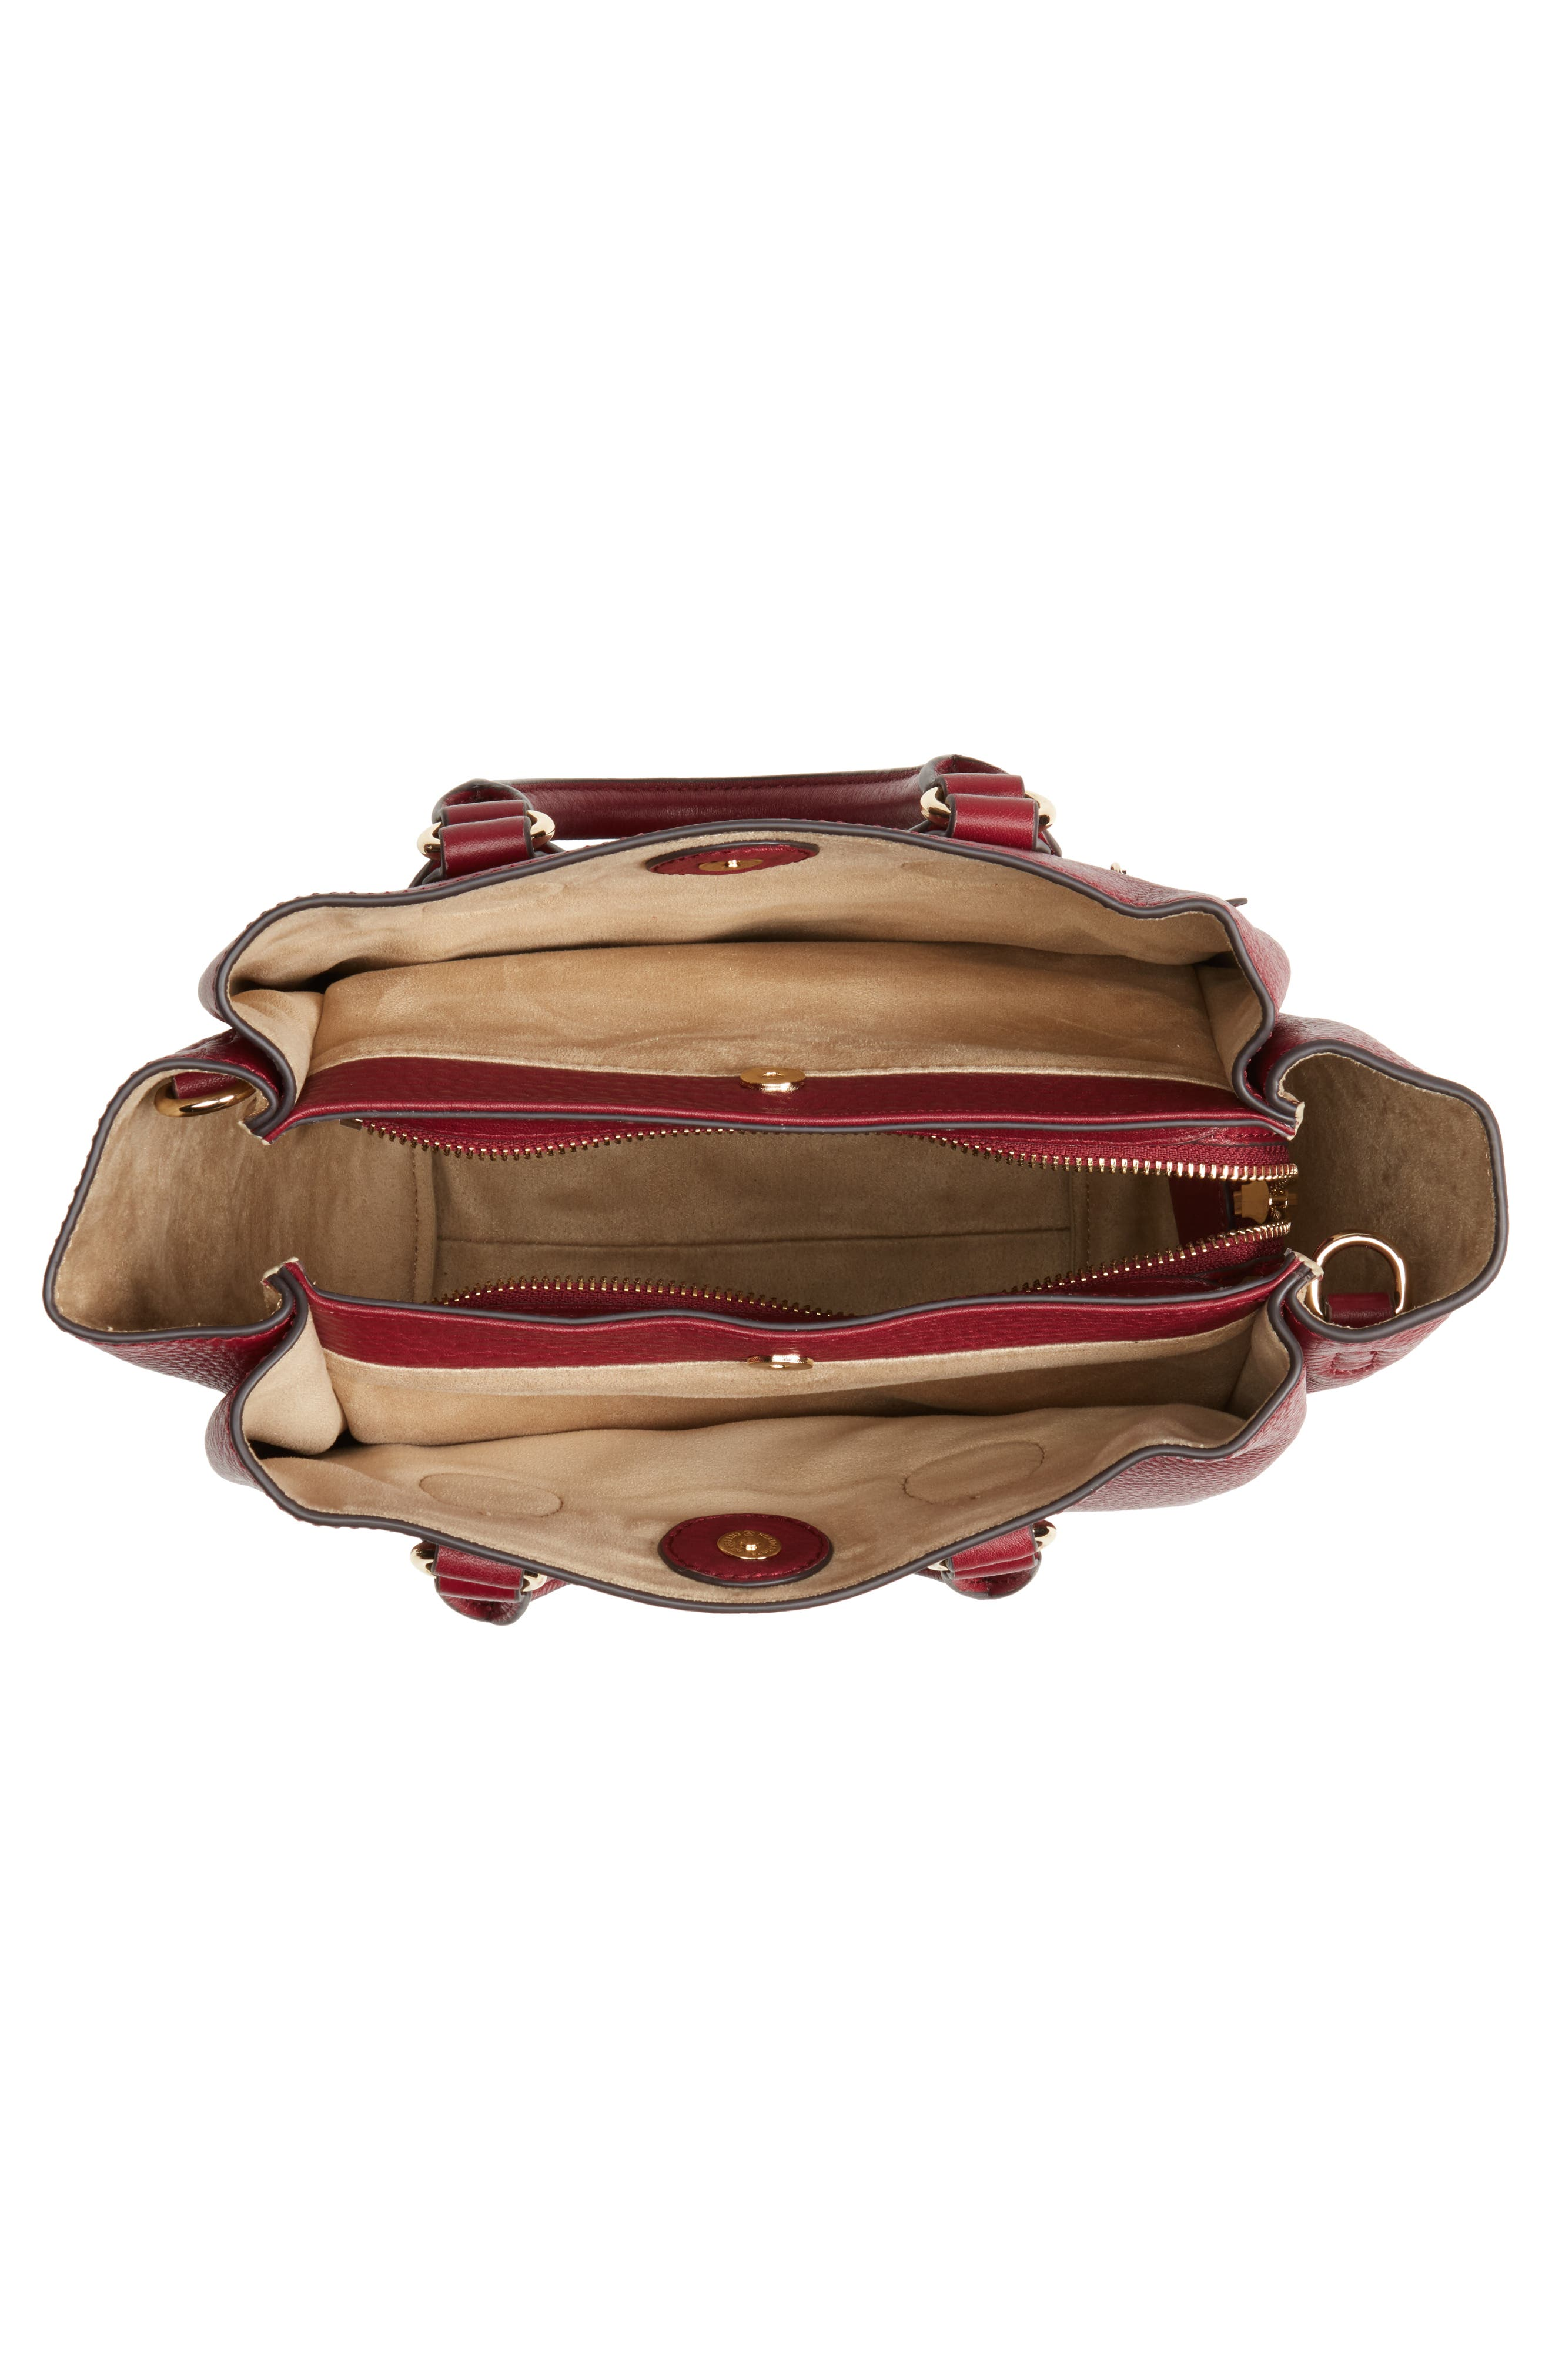 Céline Dion Small Adagio Leather Satchel,                             Alternate thumbnail 20, color,